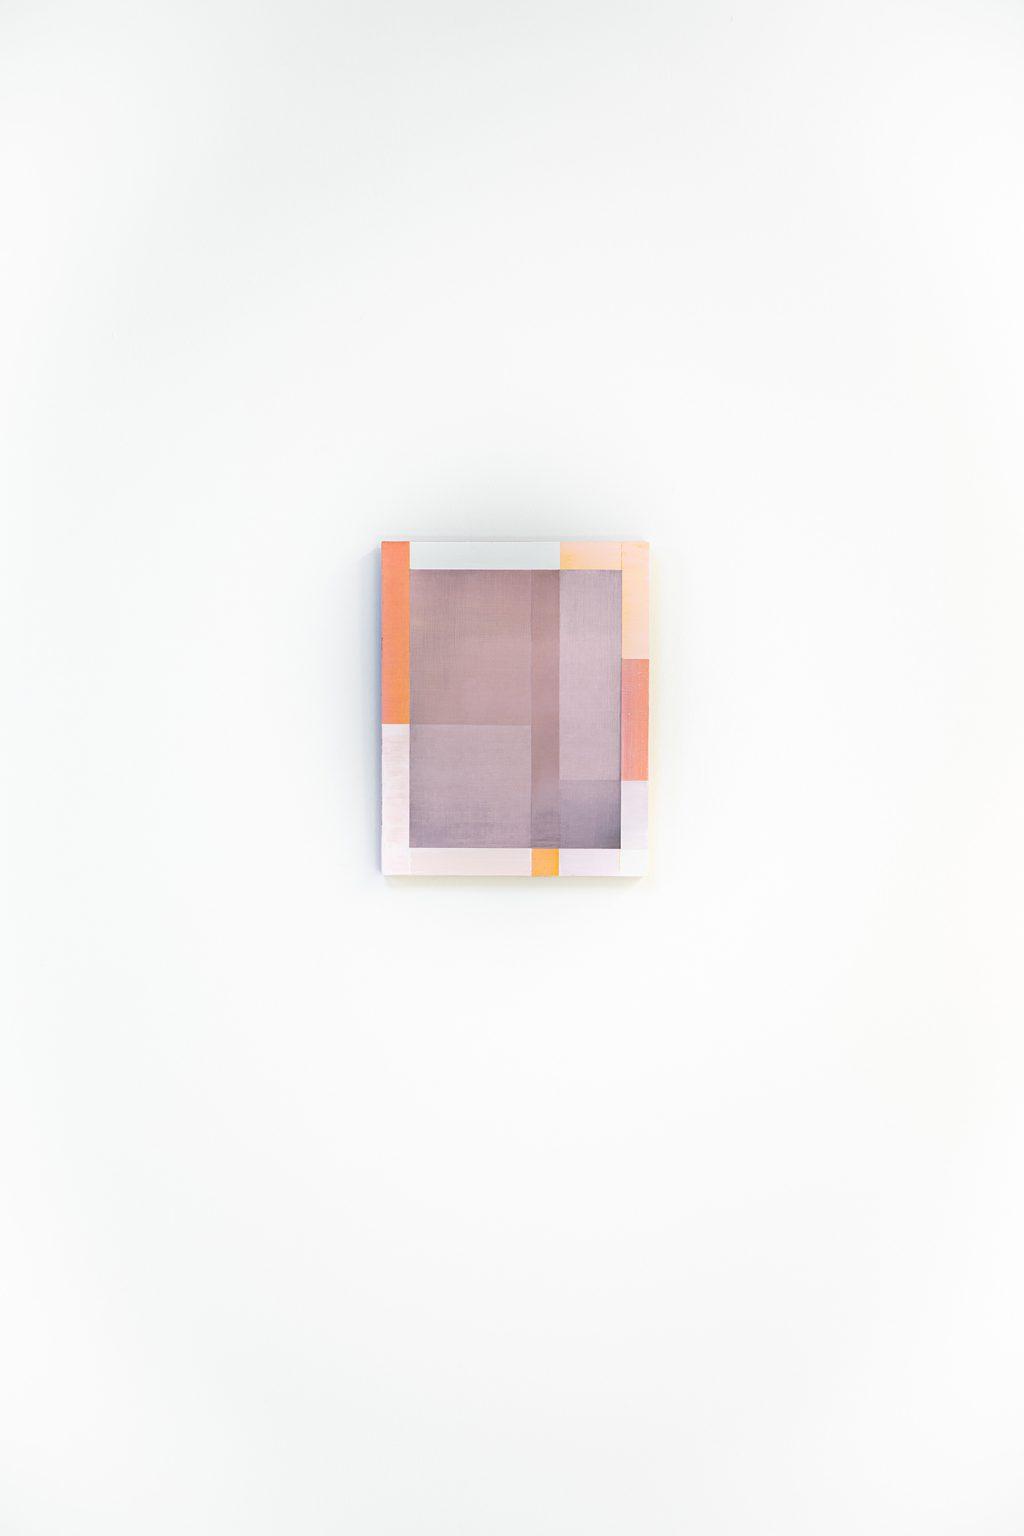 untitled #09-2020